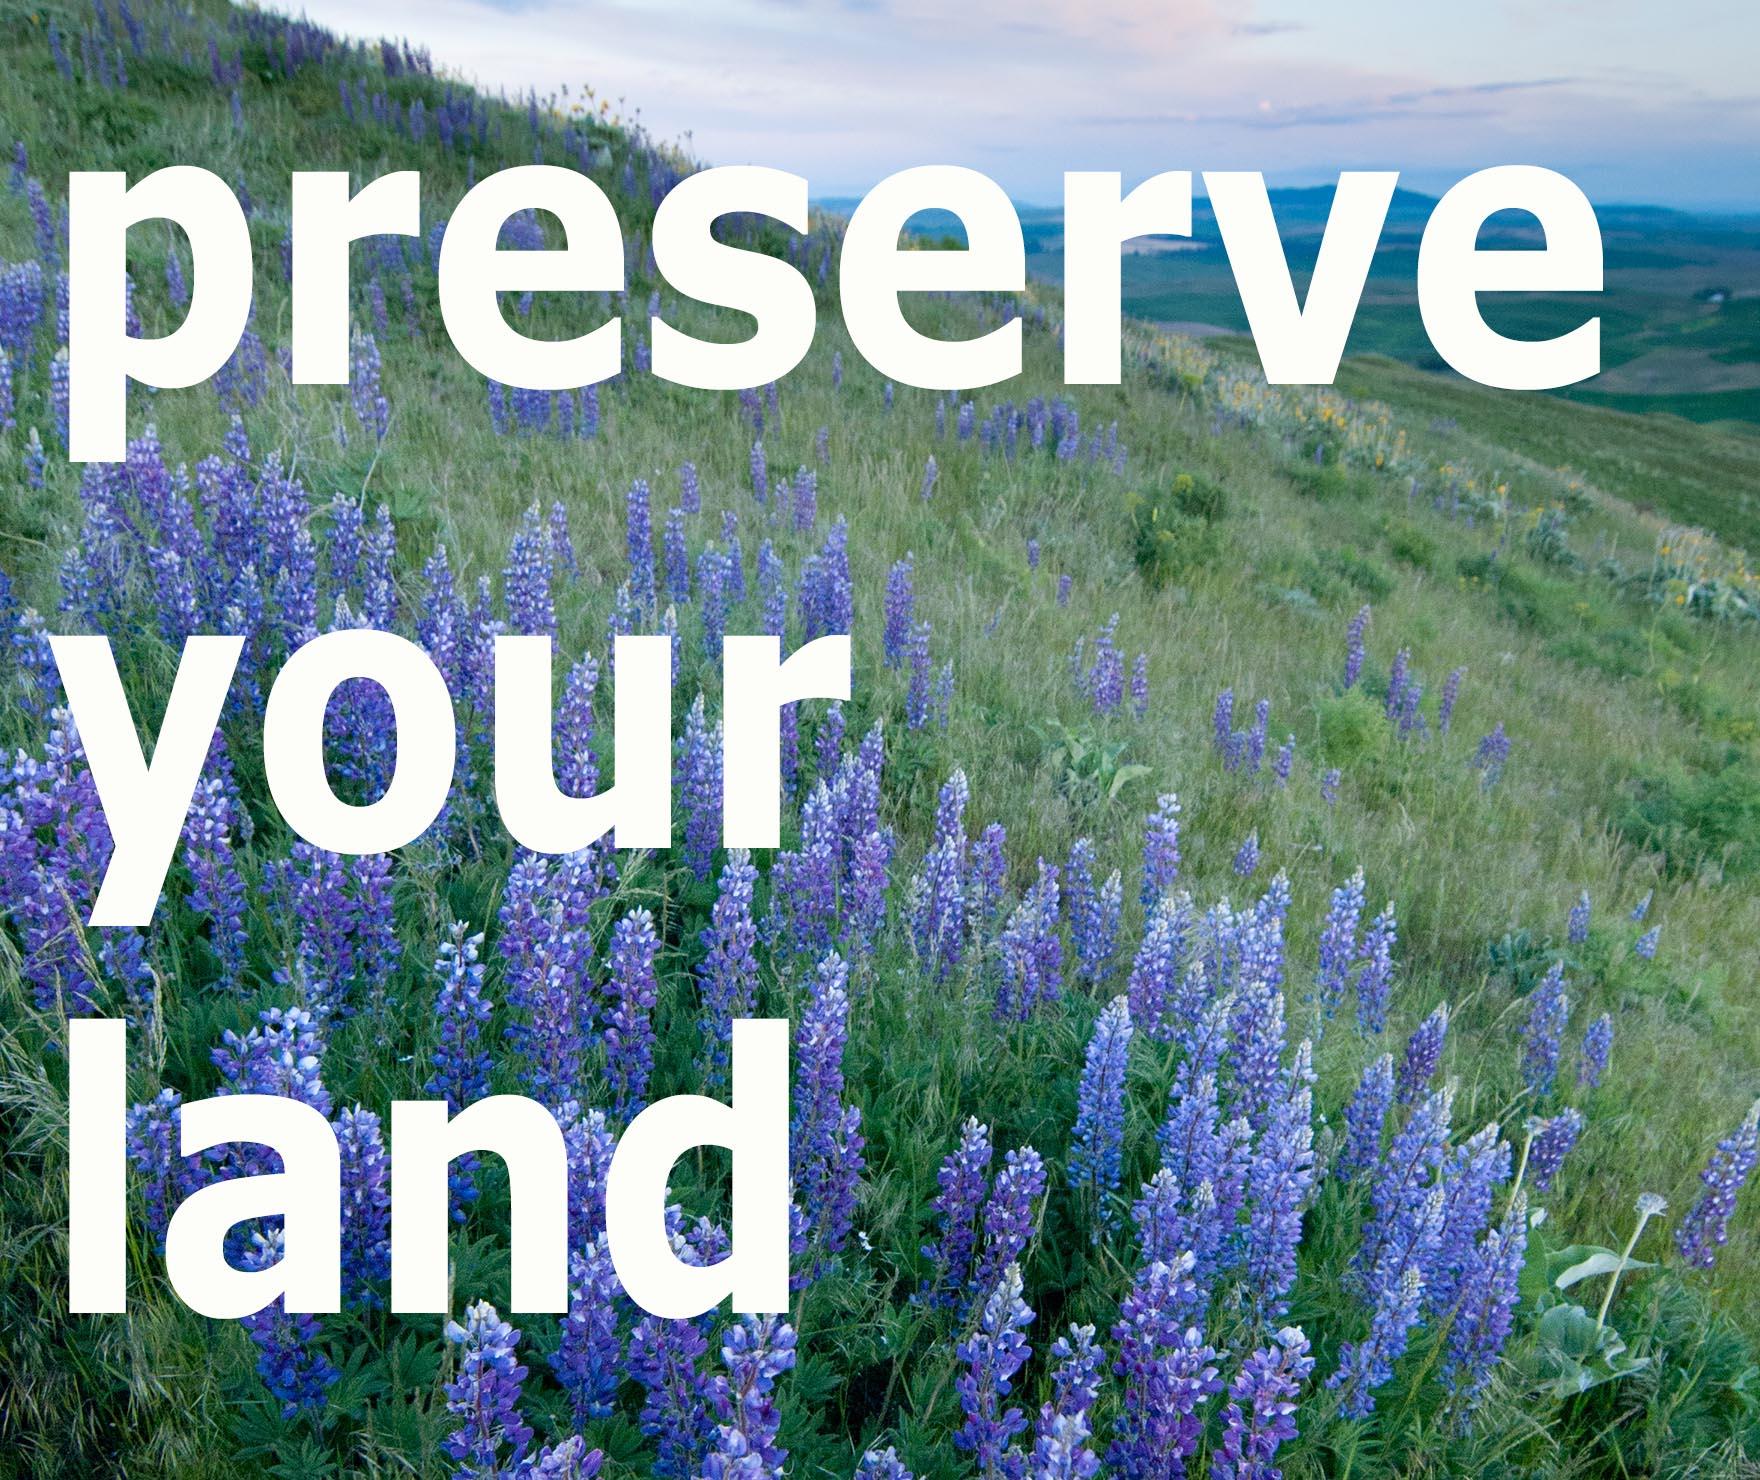 preserve your land.jpg